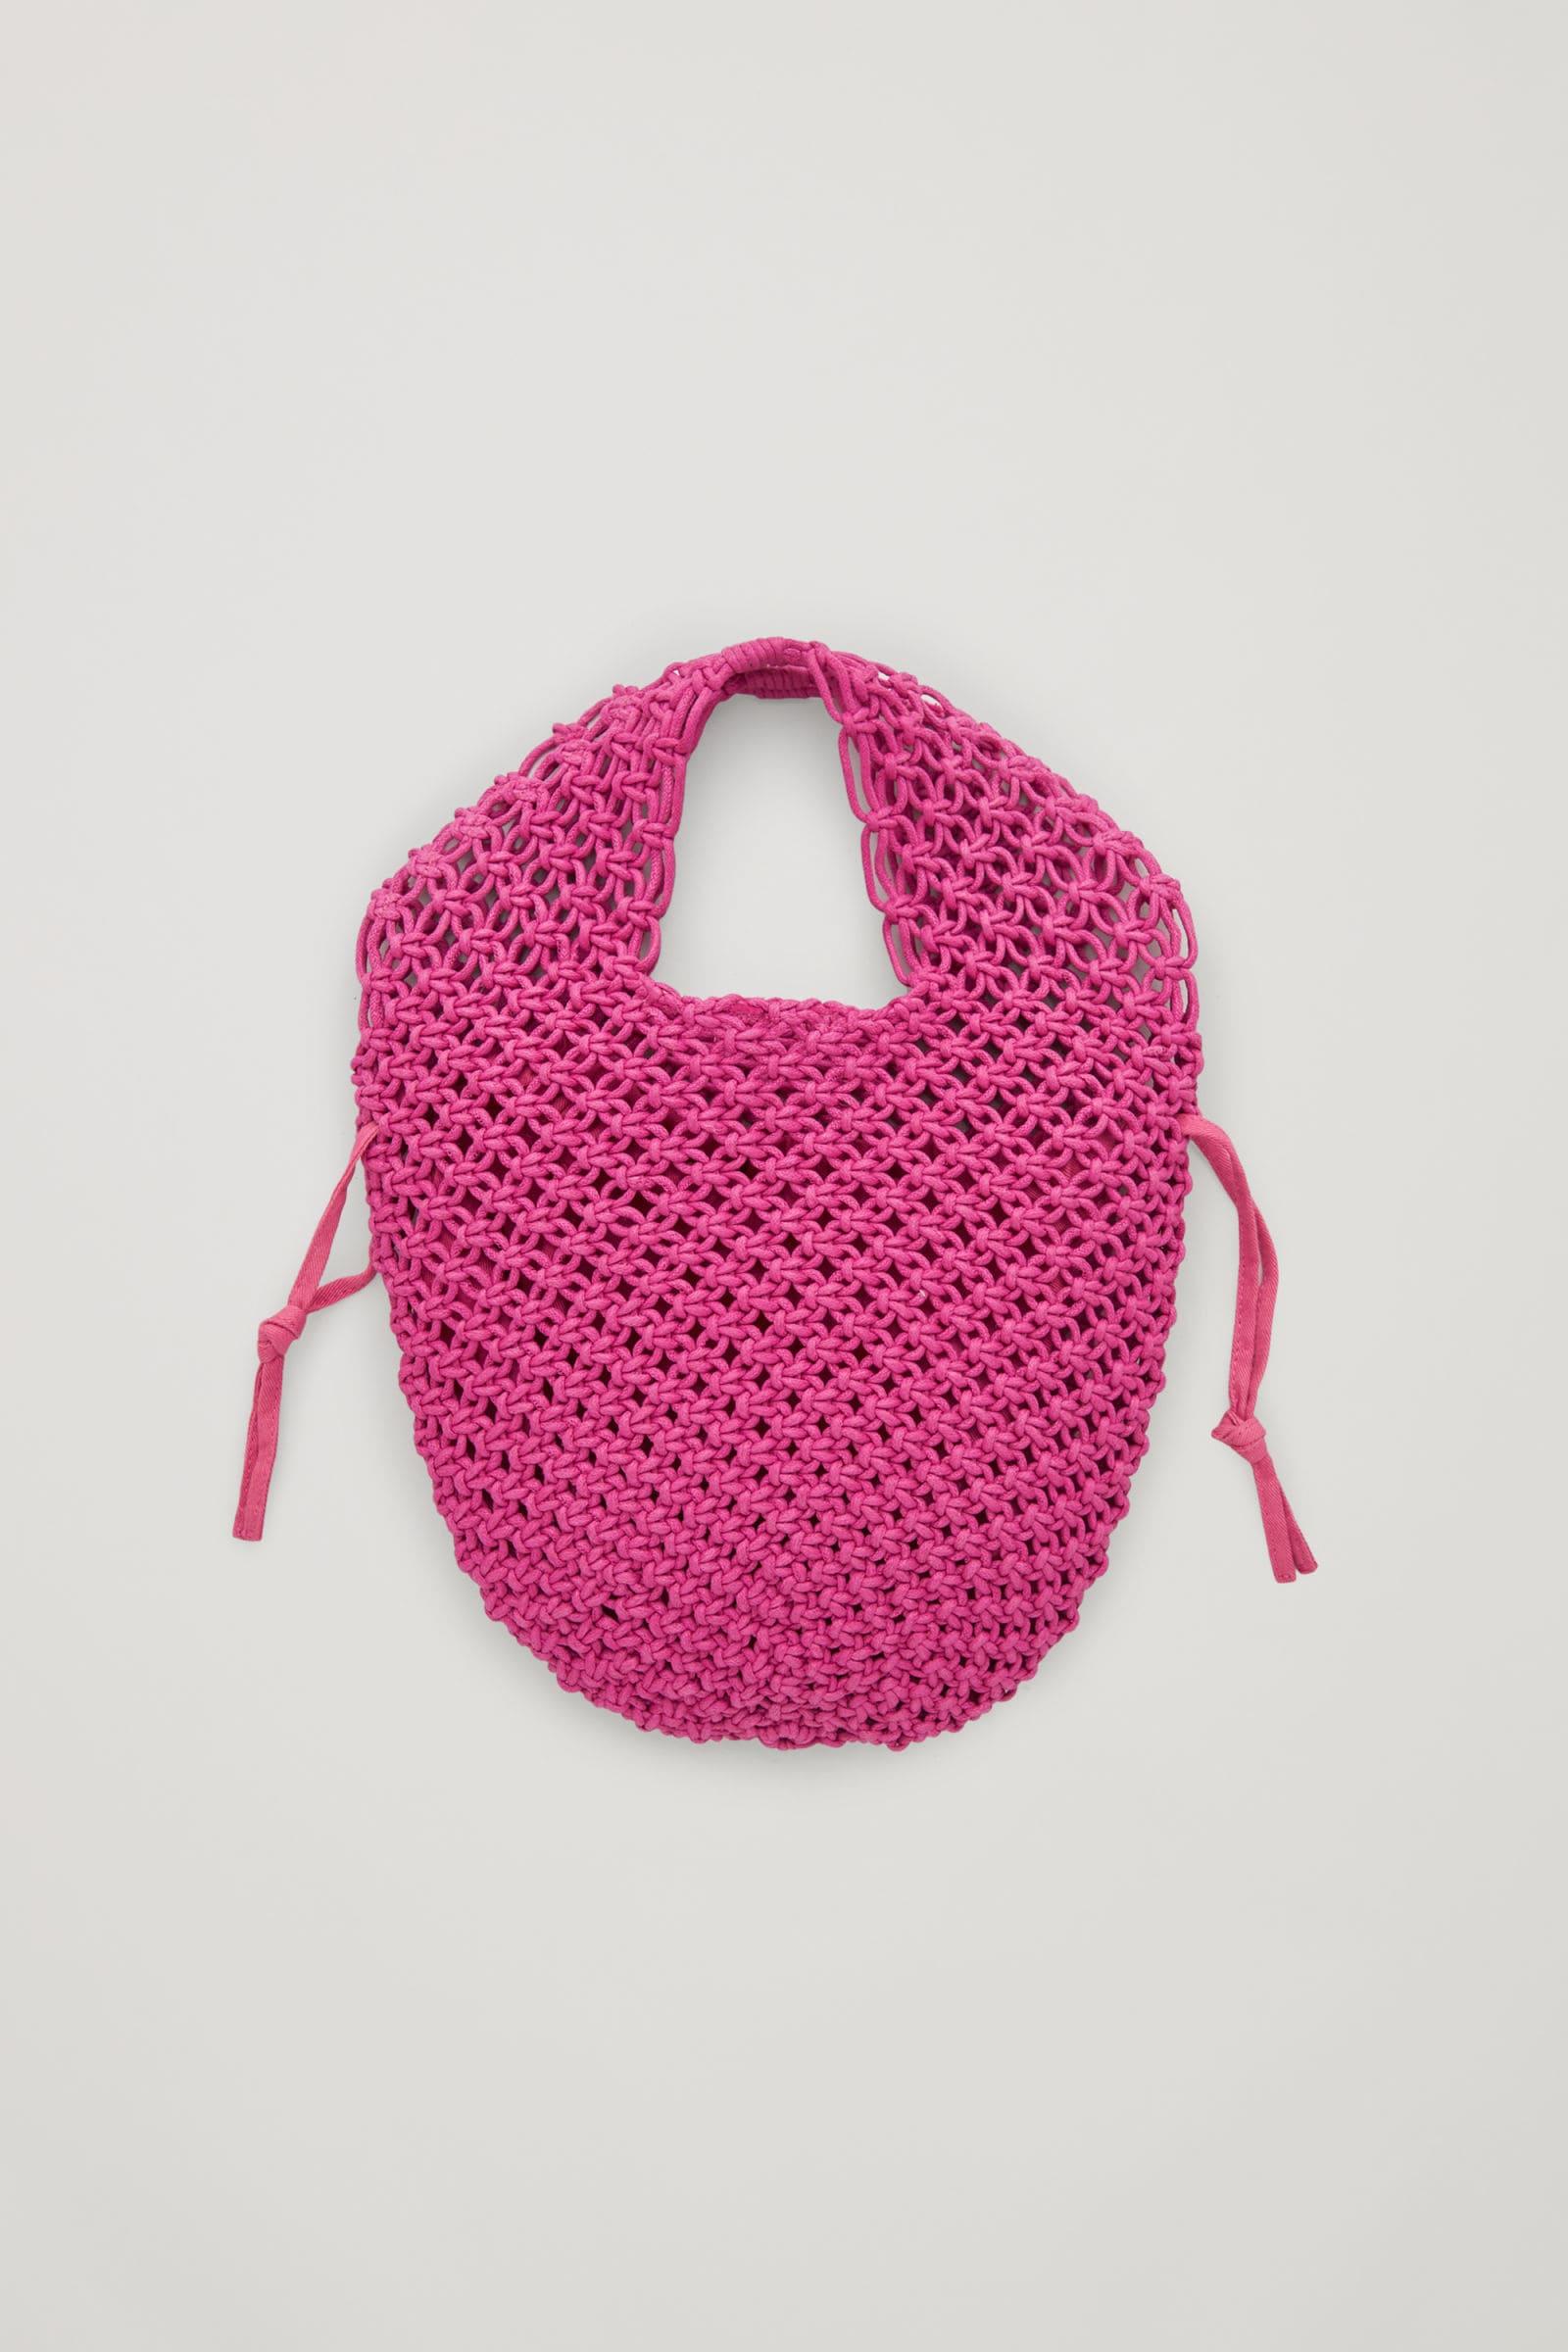 Rosa crotcheted väska